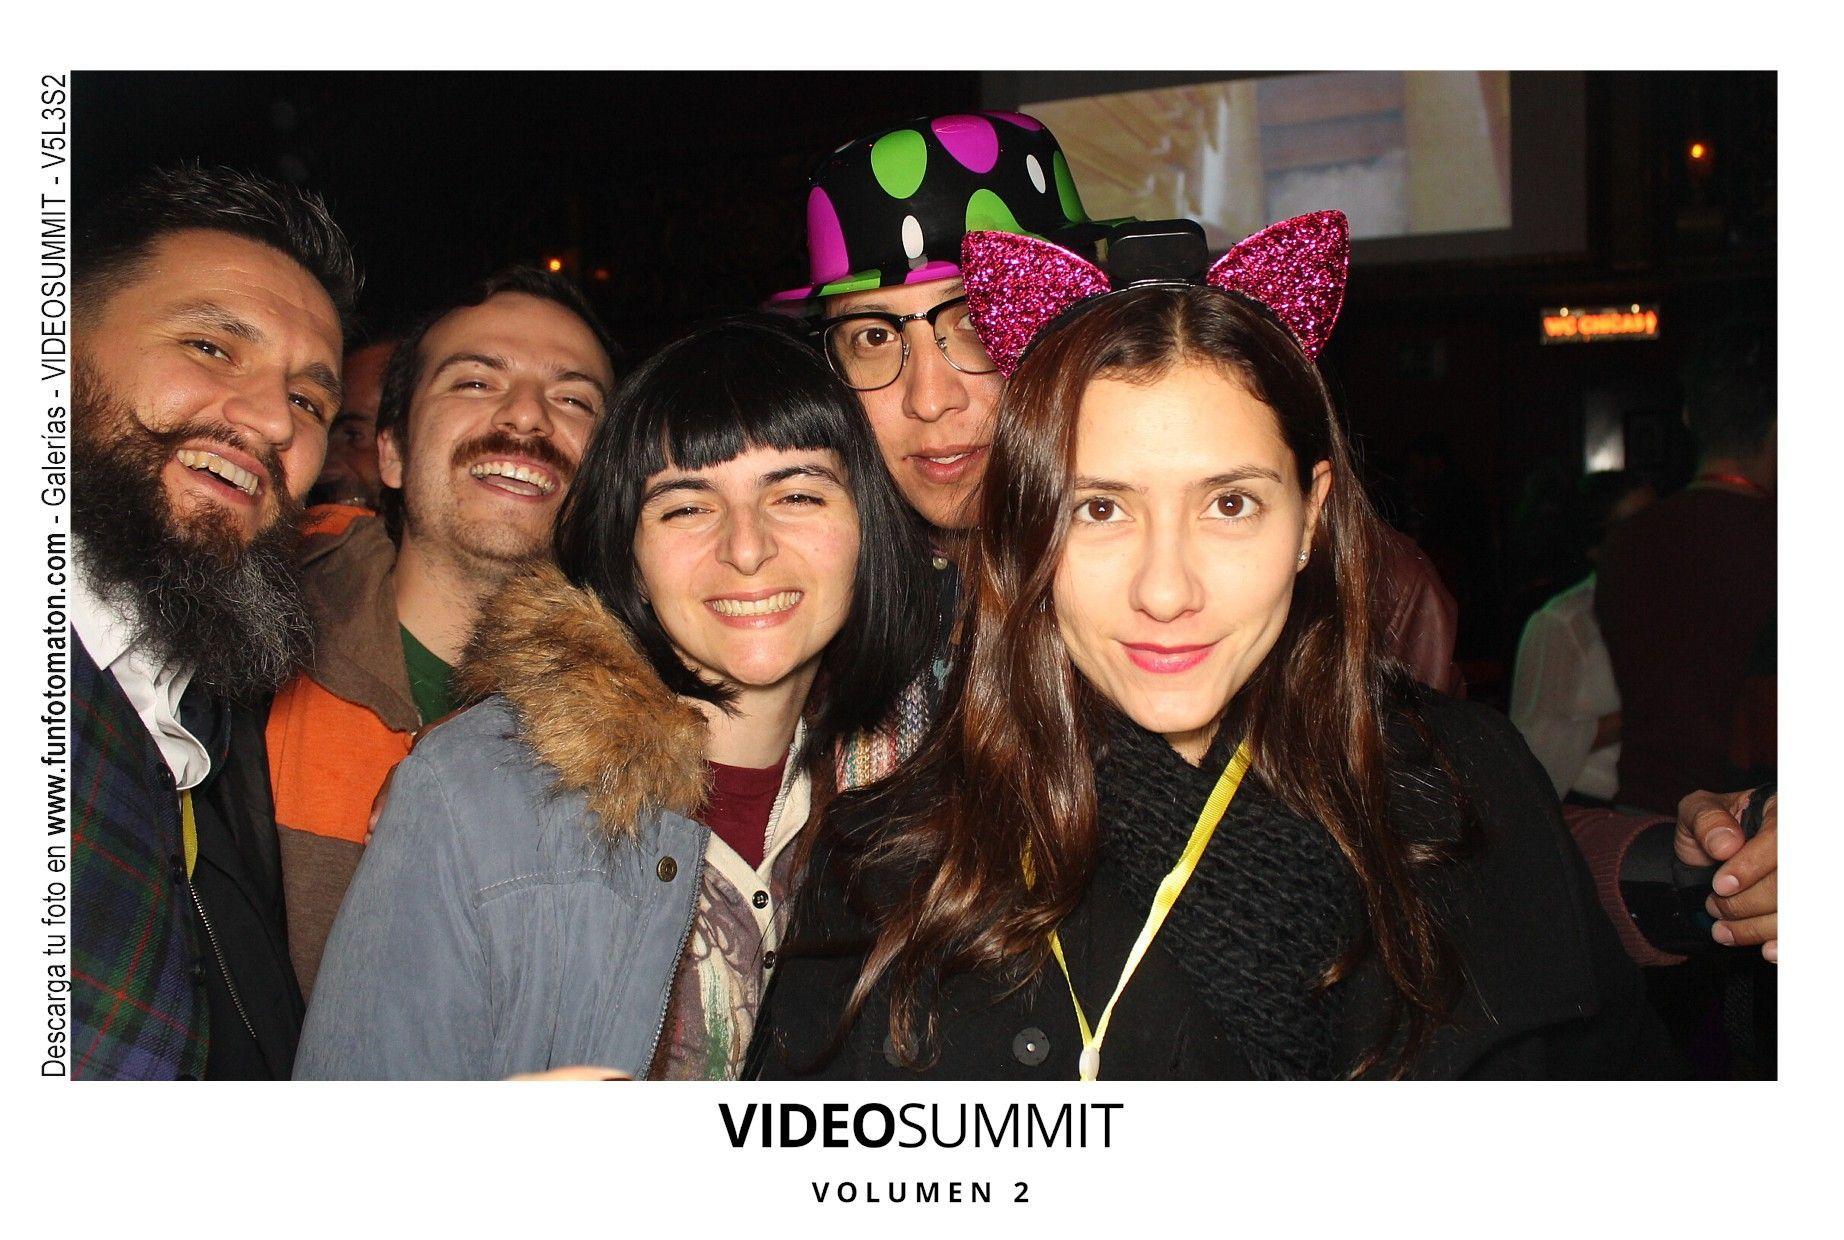 videosummit-vol2-club-party-025